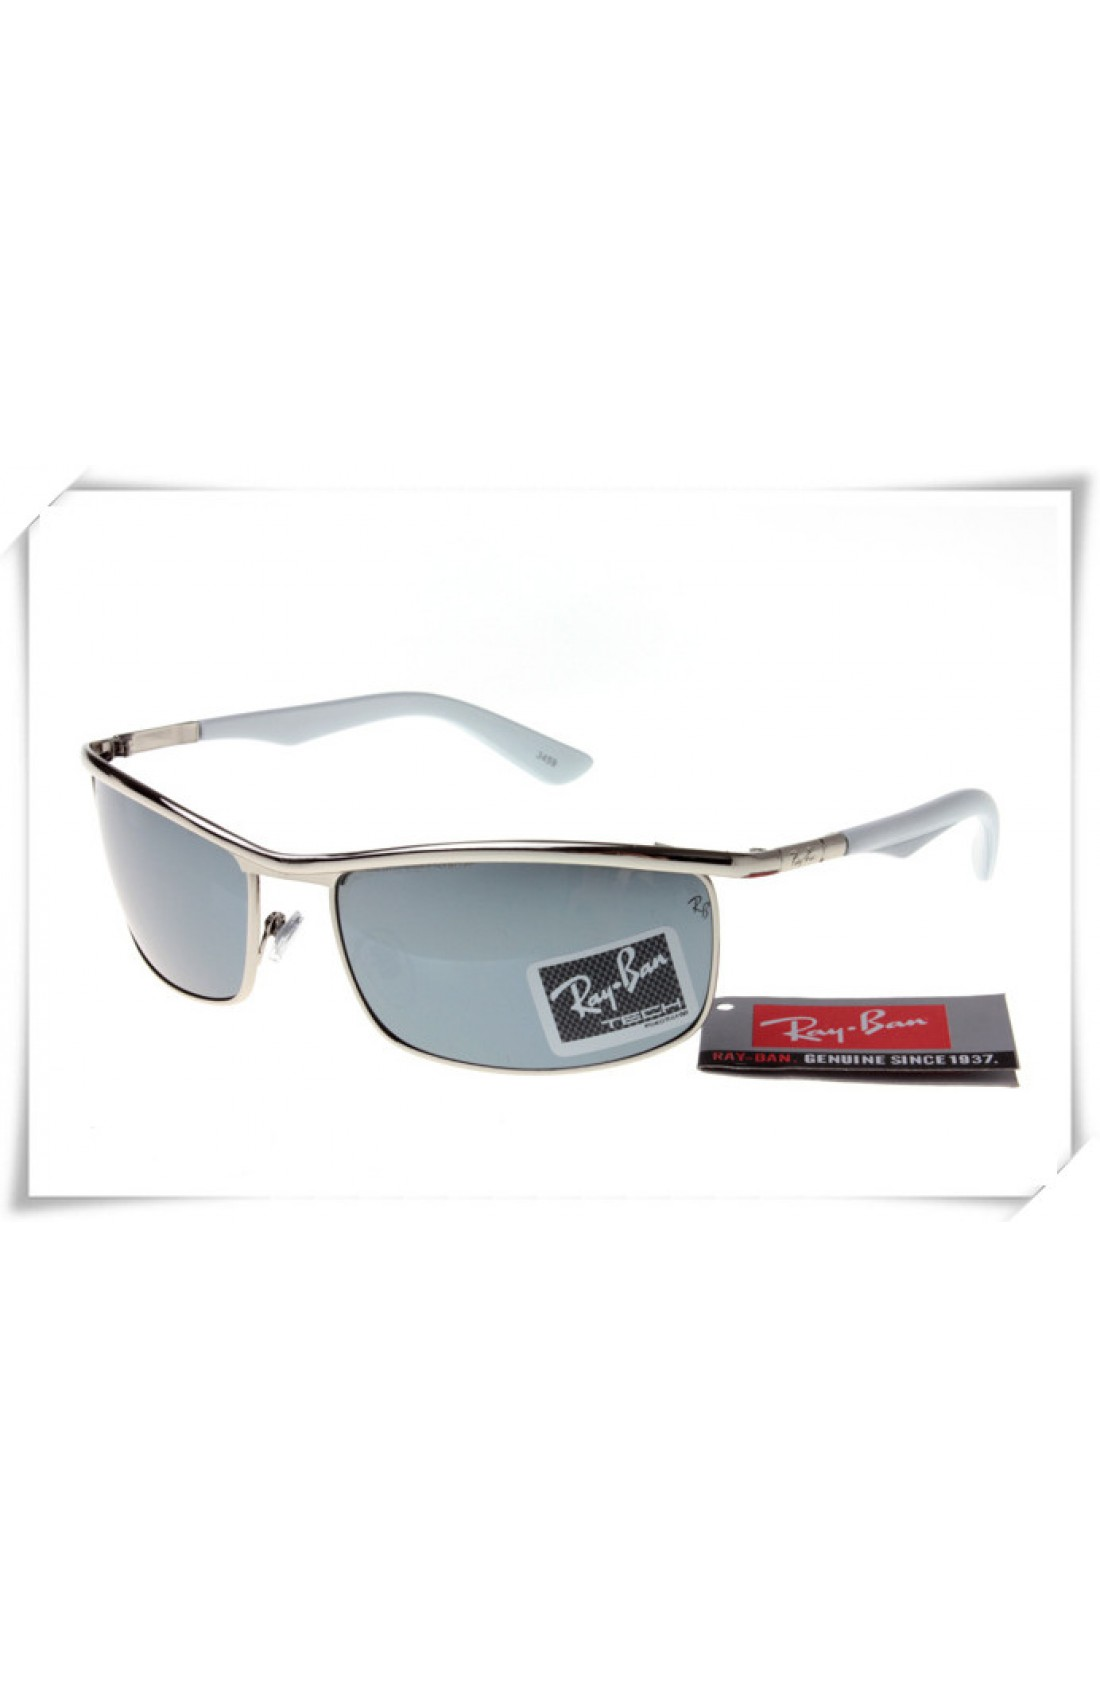 Ray Ban Rb3459 Sunglasses Gunmetal Grey Frame Grey Lens